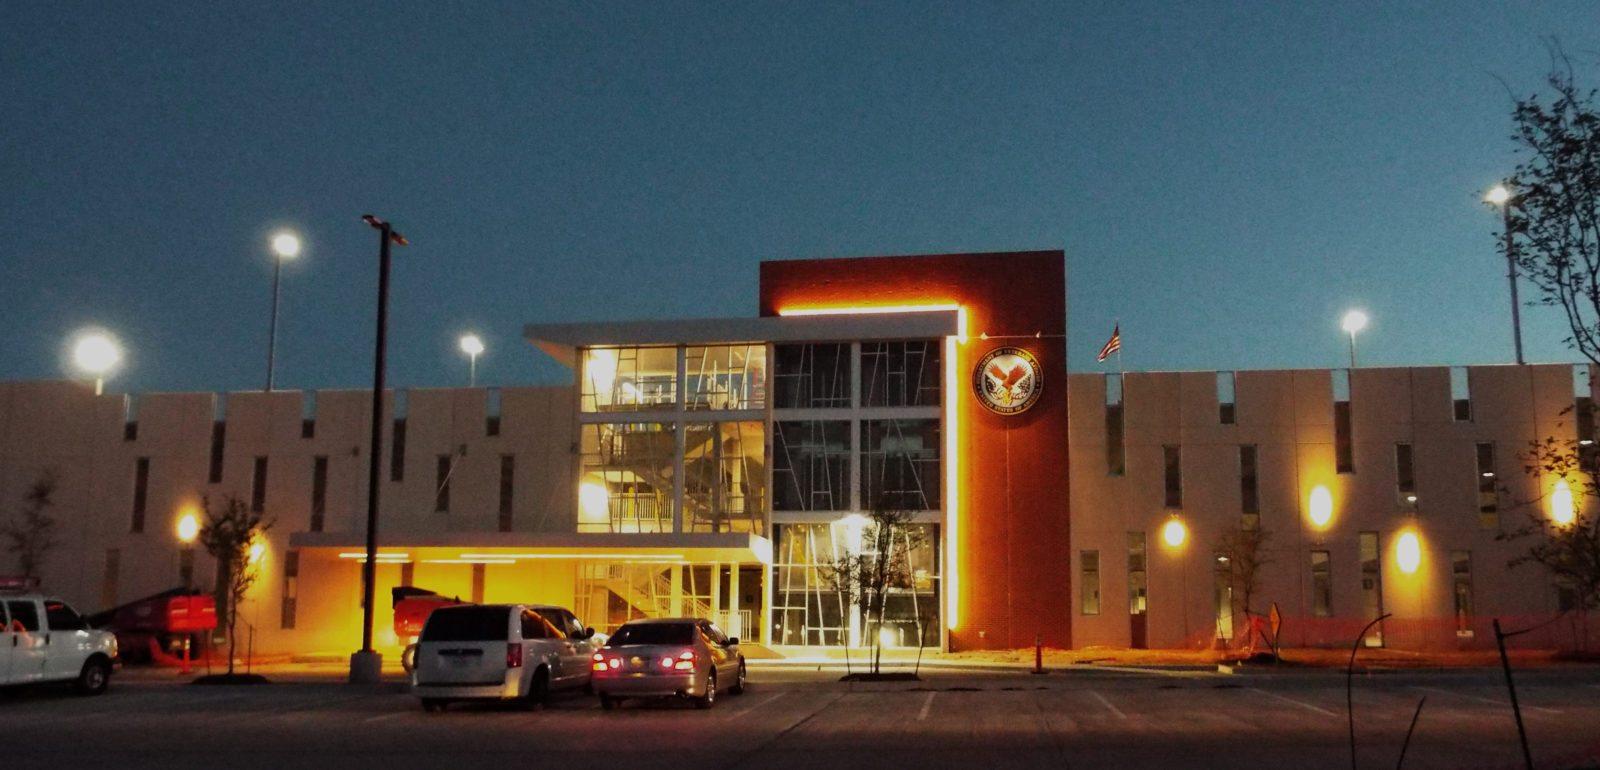 Department of Veterans Affairs - Patient Parking Garage